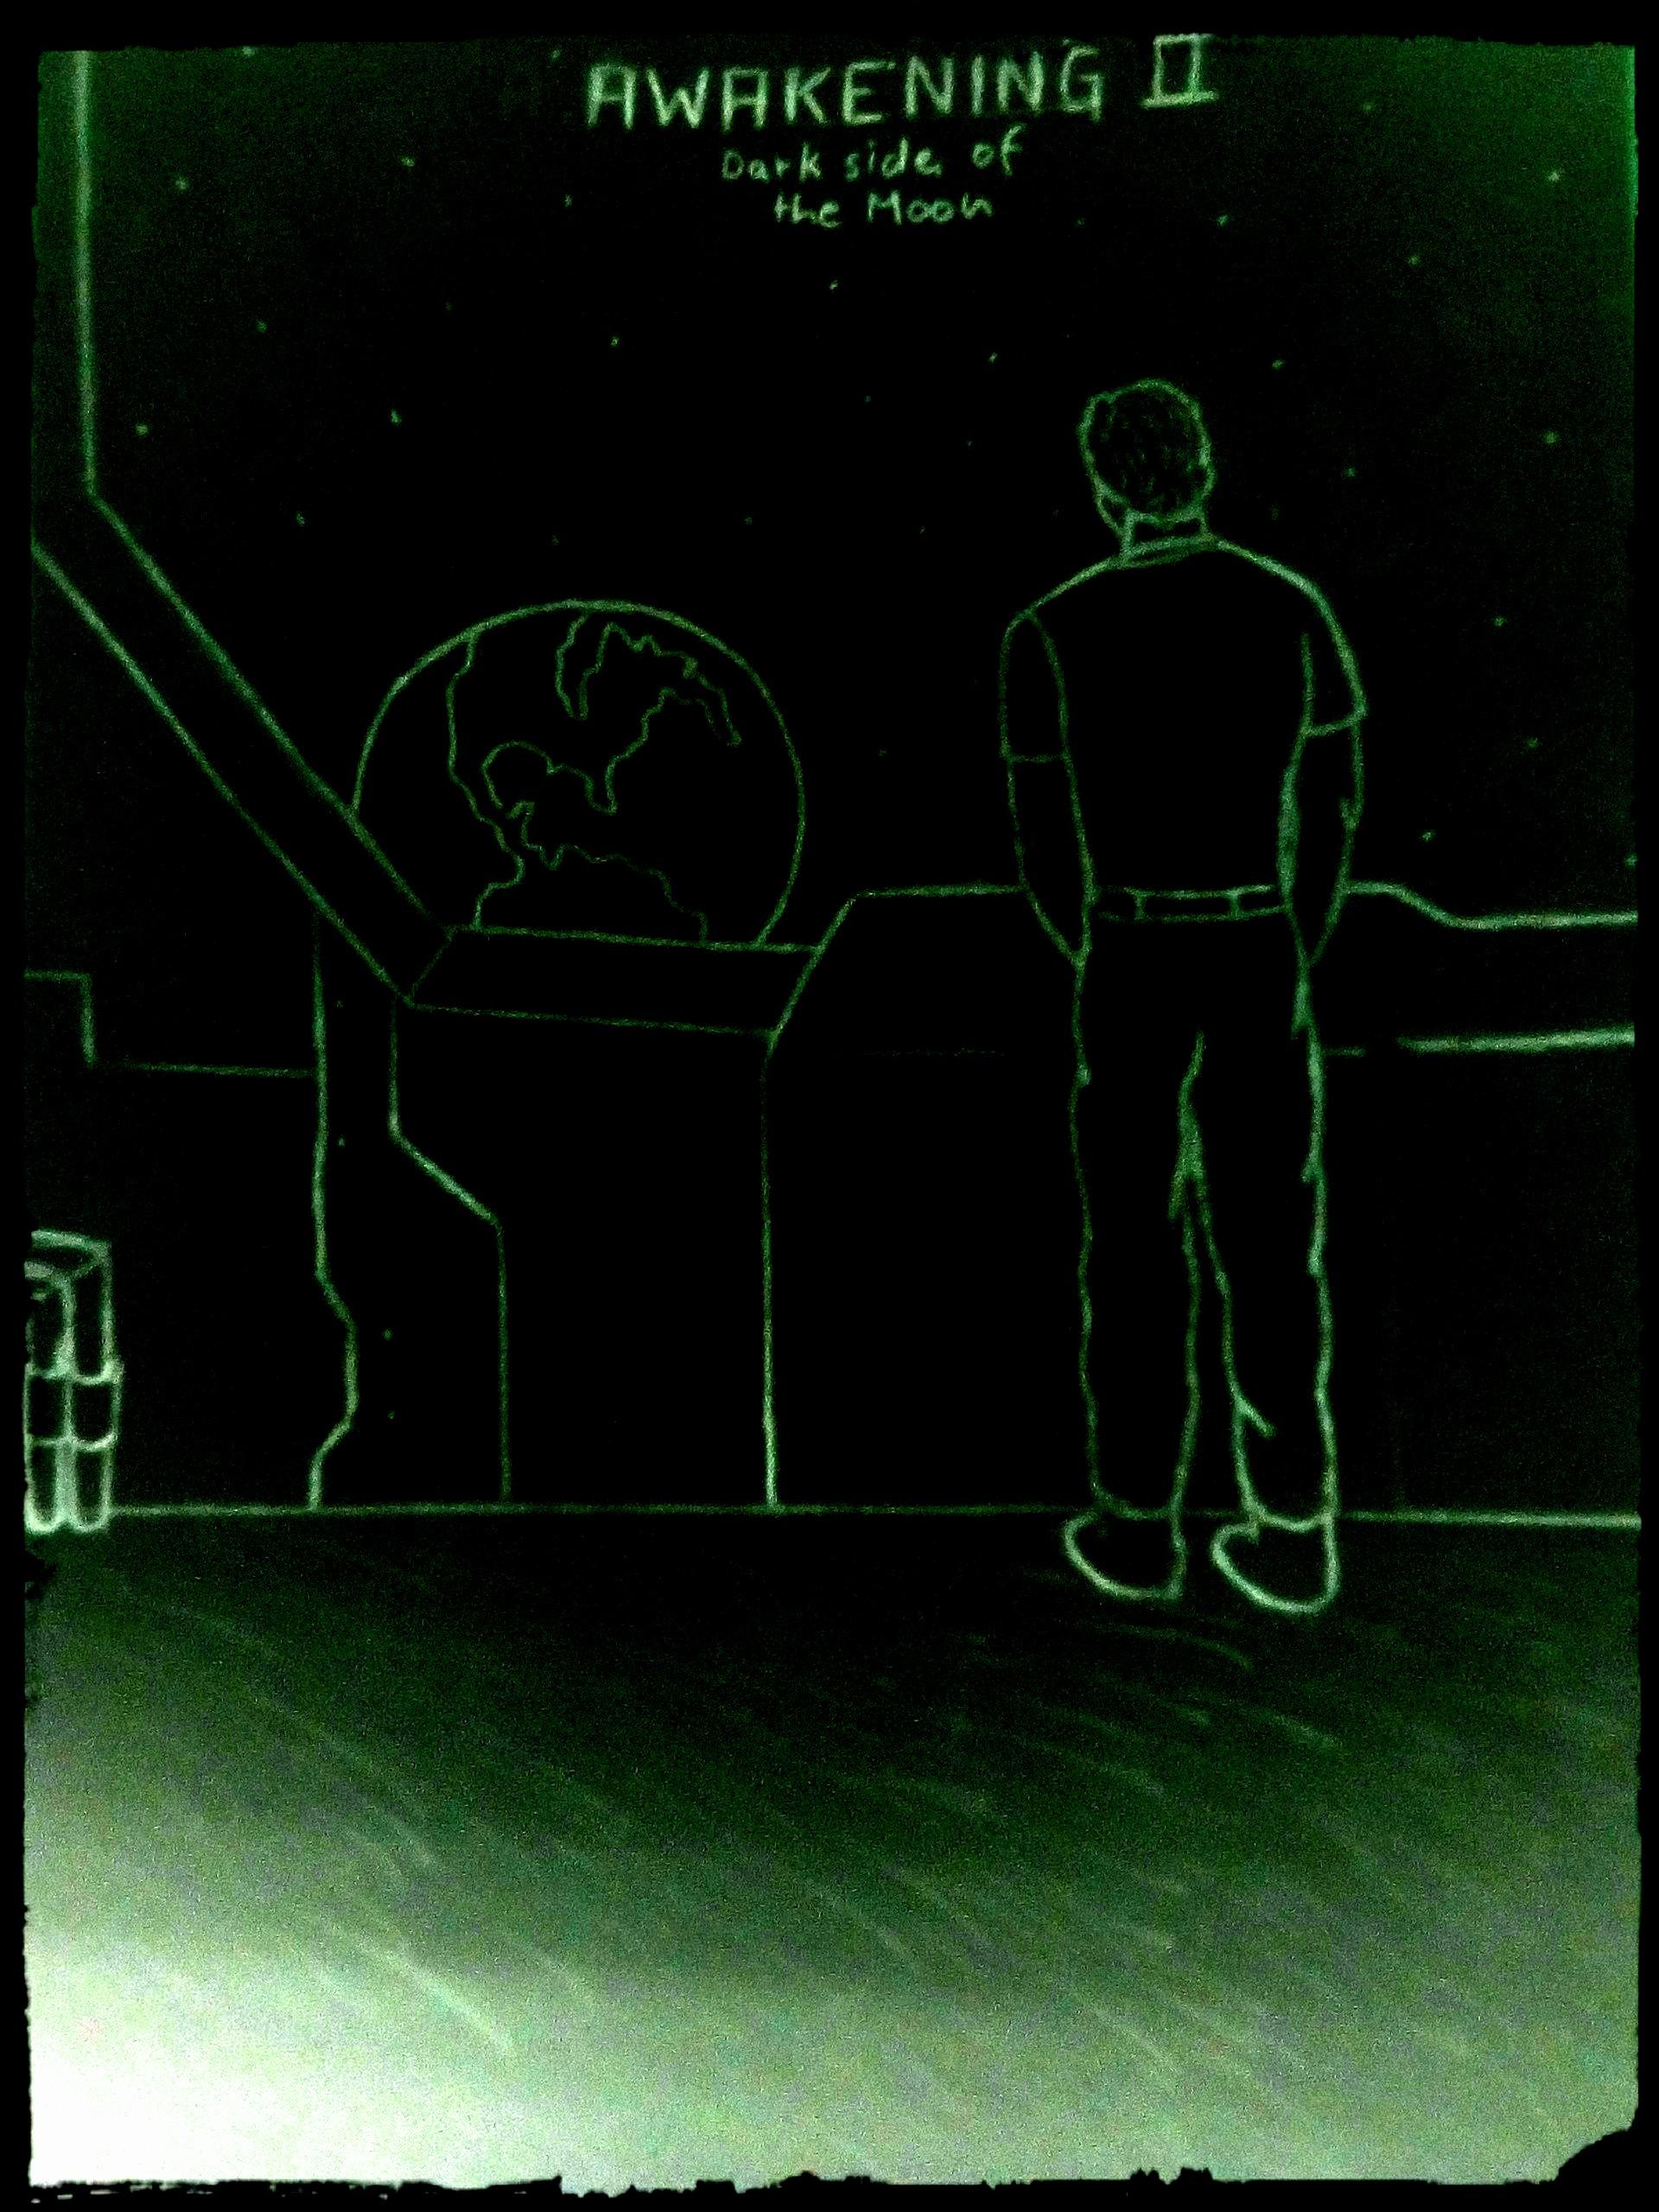 AWAKENING 2 - Dark Side of the Moon